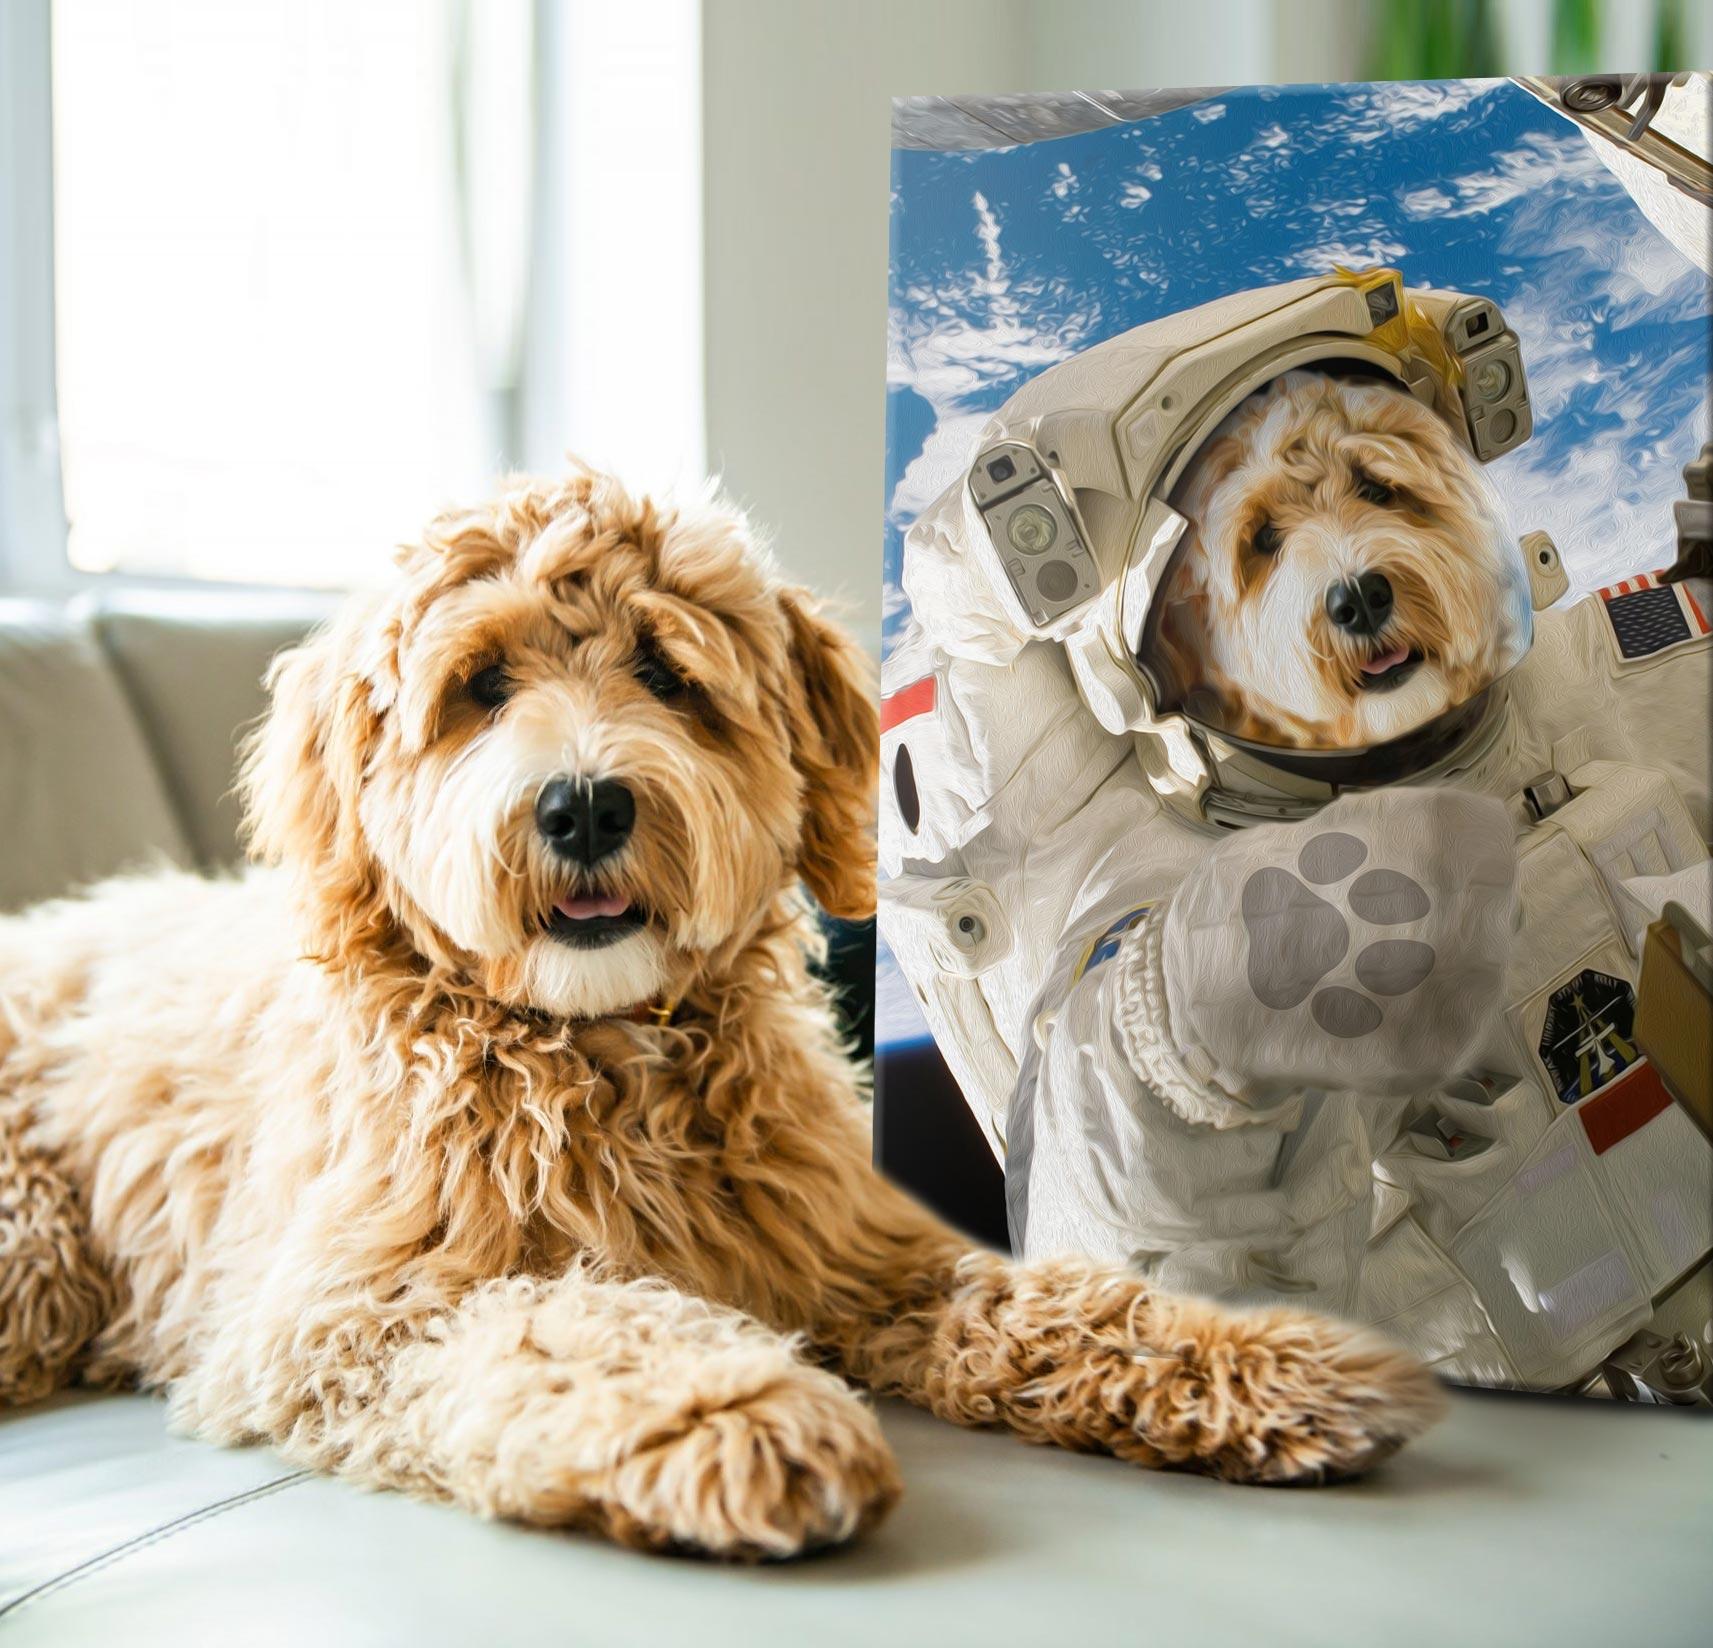 Buy a Custom Astronaut Pet Portrait | The Astronaut